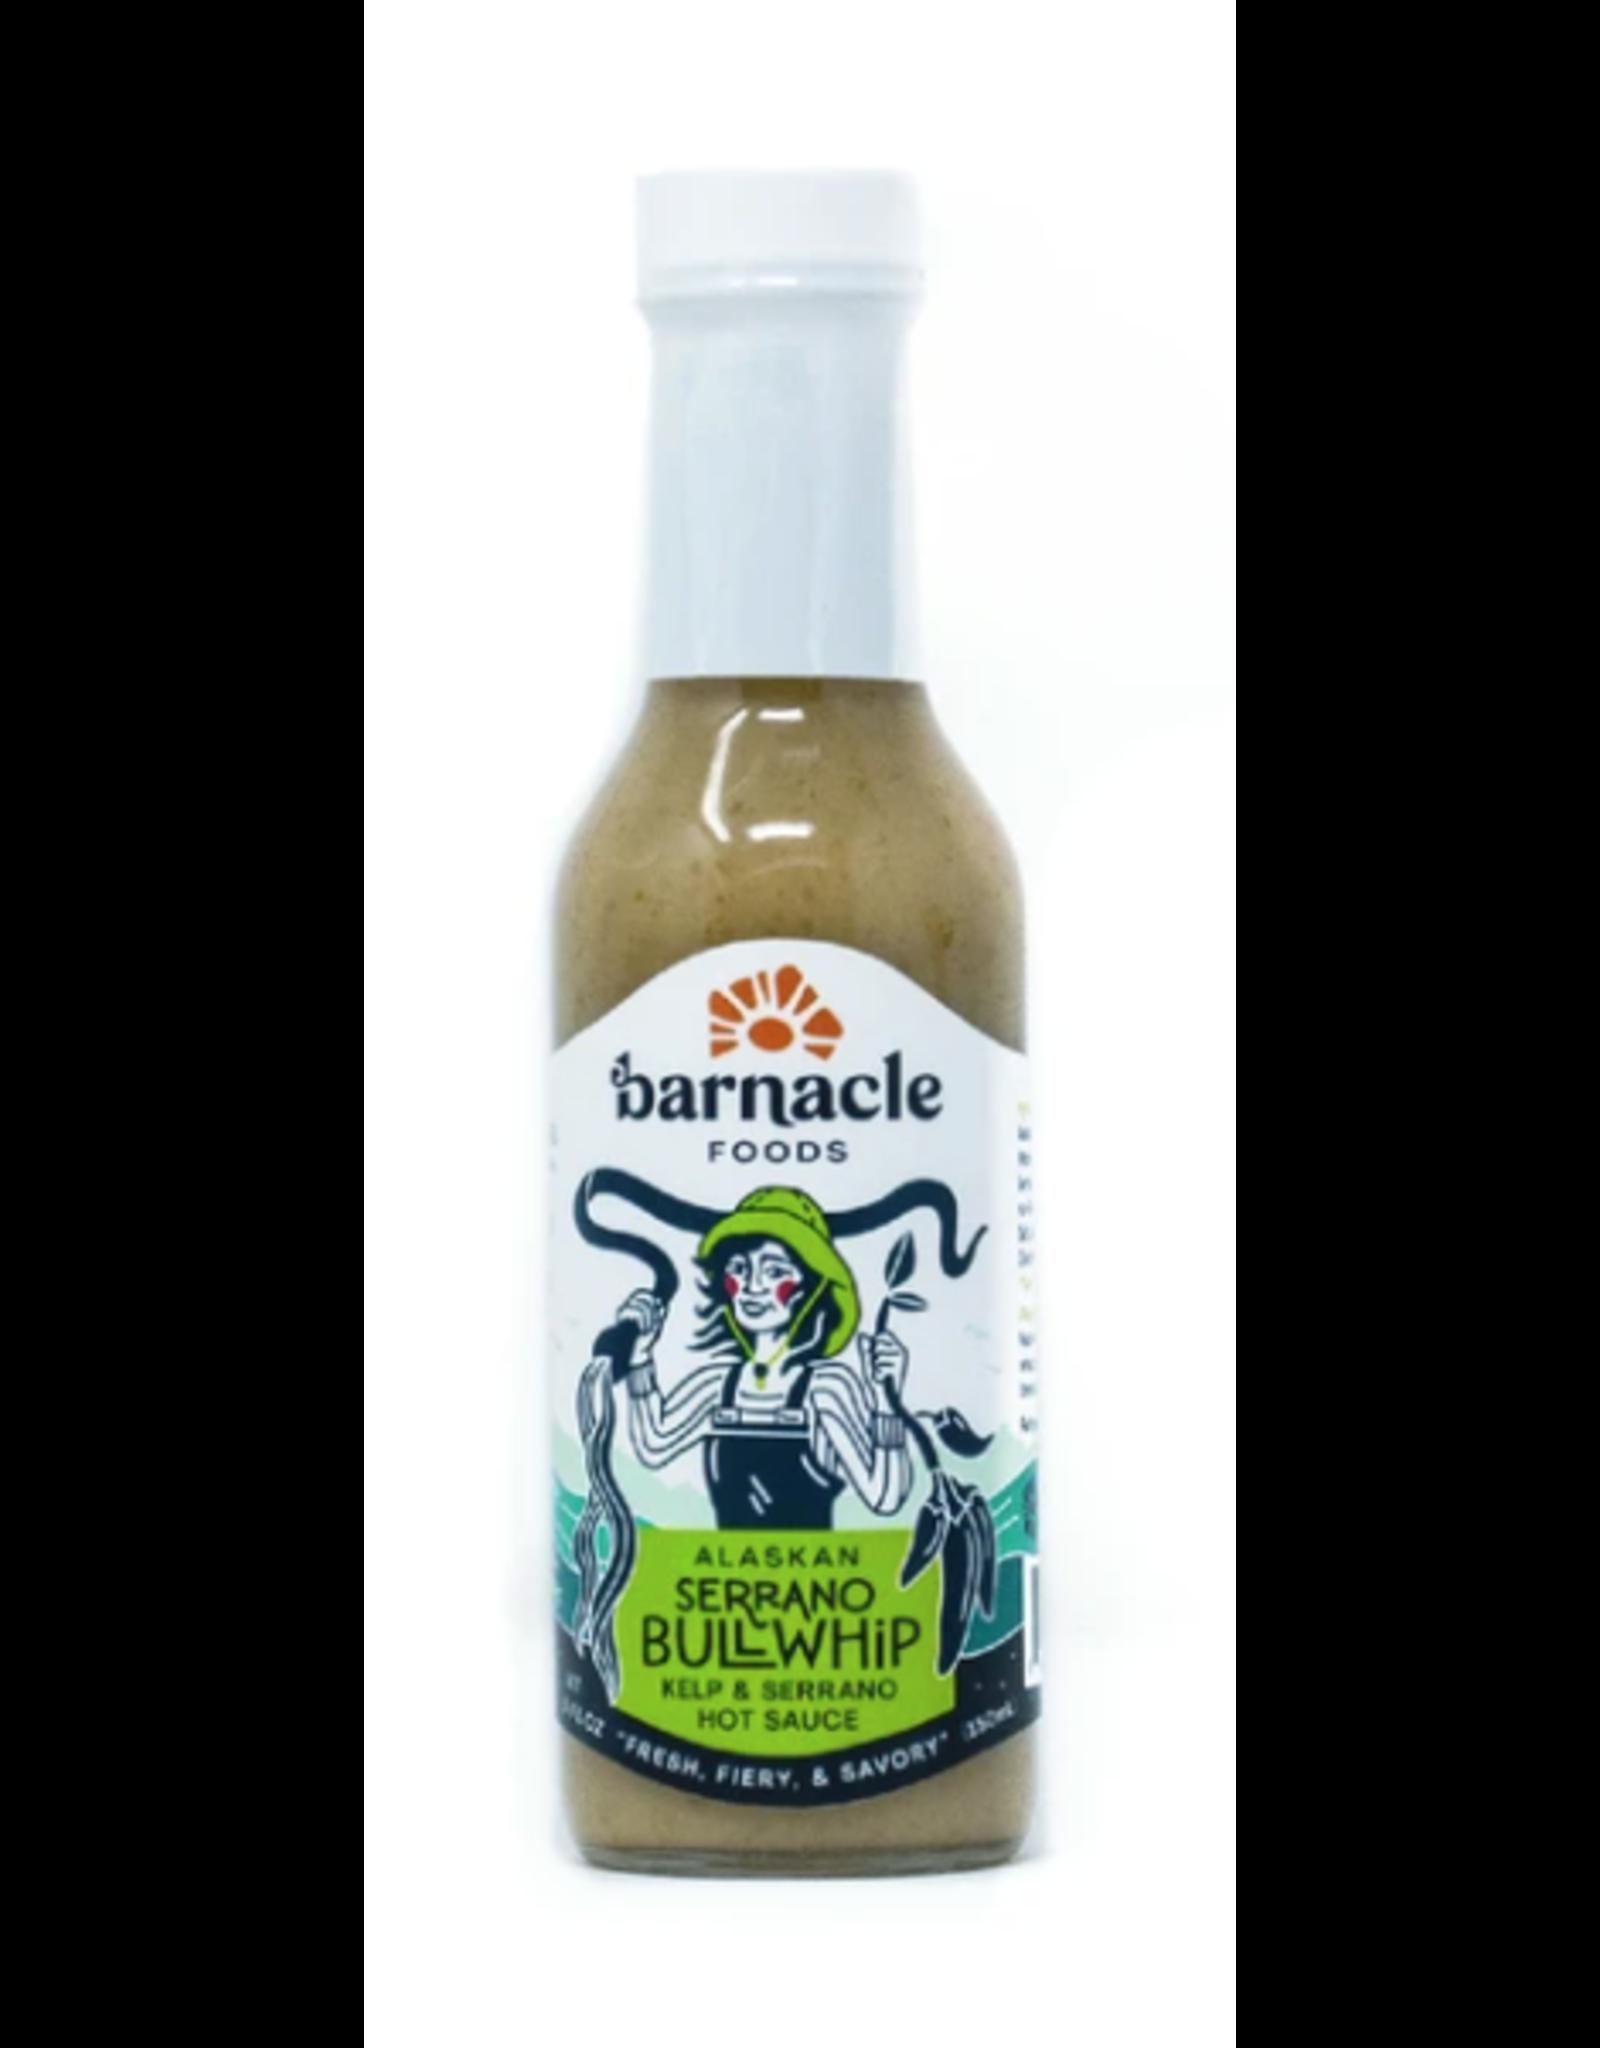 Barnacle Foods Serrano Bullwhip Hot Sauce | Barnacle Foods